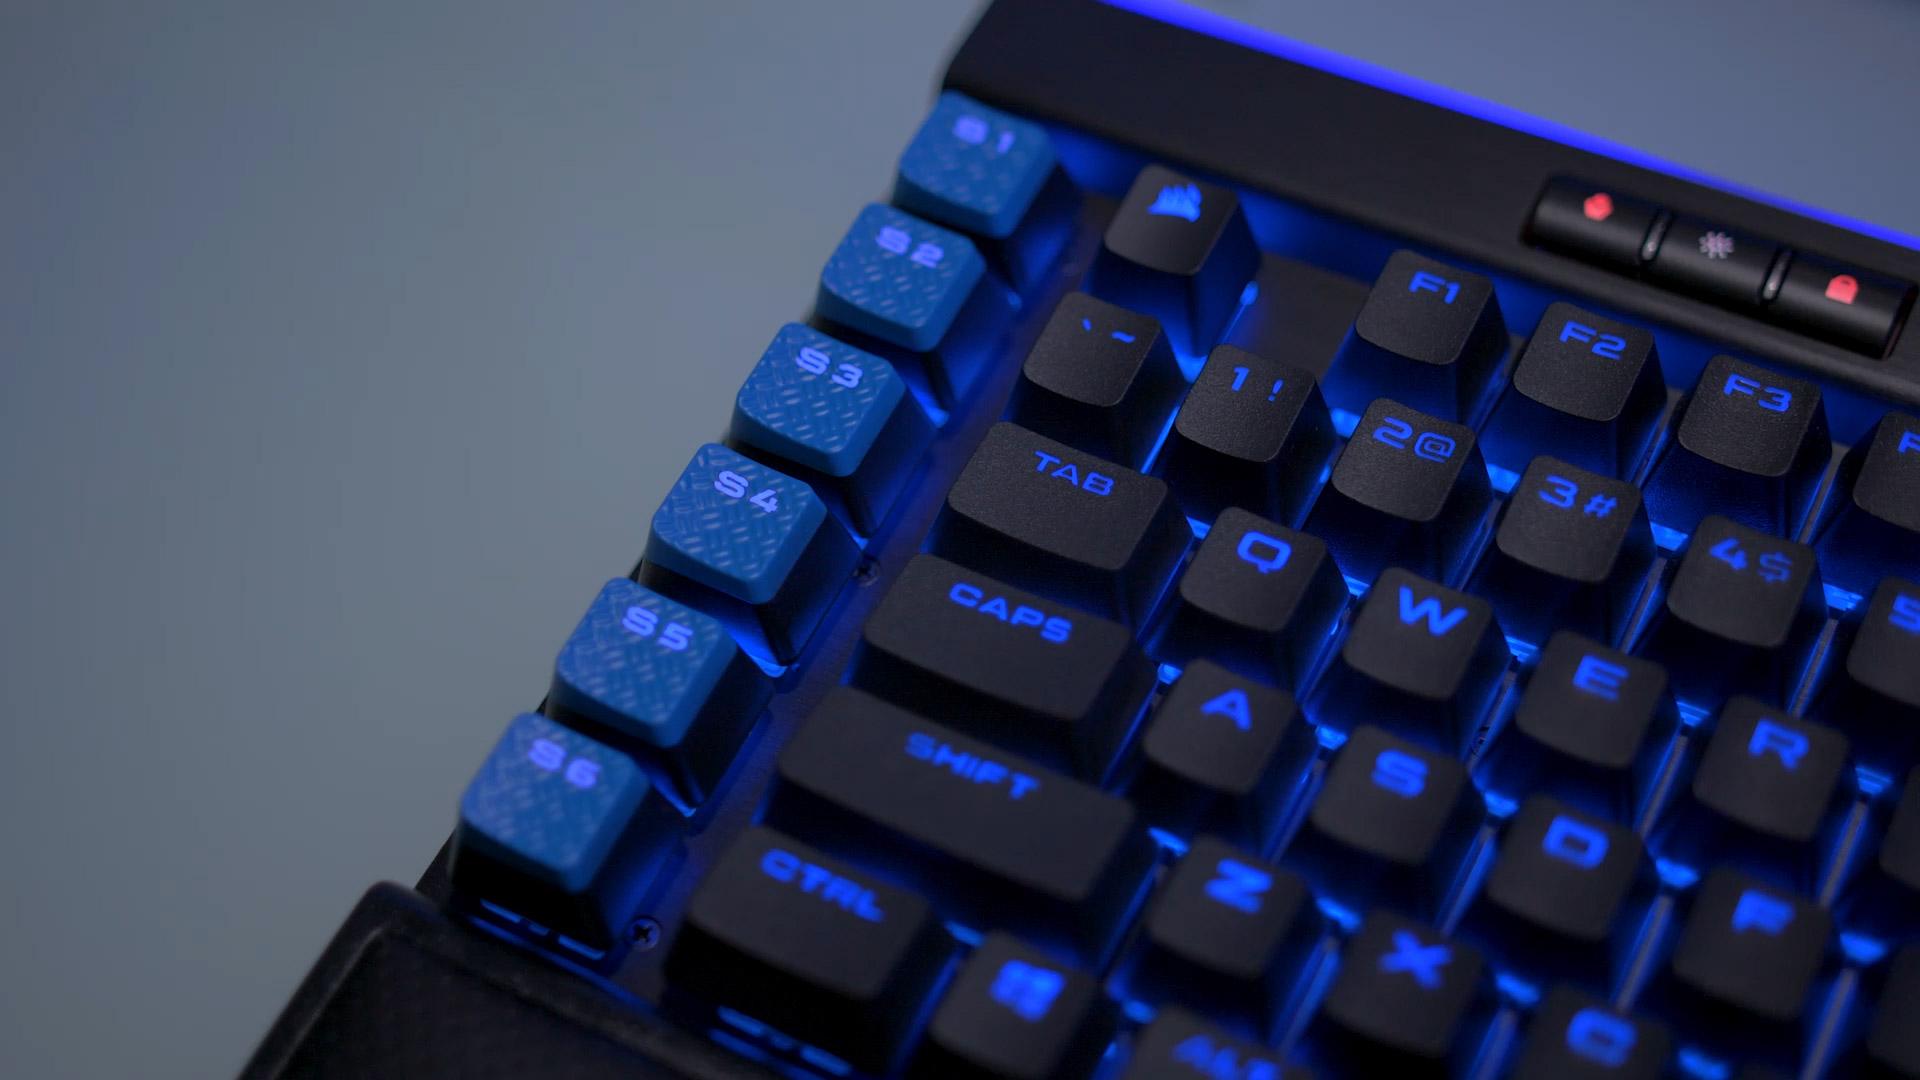 Corsair K95 Platinum Fortnite Game Profile Corsair K95 Rgb Platinum Xt Mechanical Gaming Keyboard Cherry Mx Brown Umart Com Au